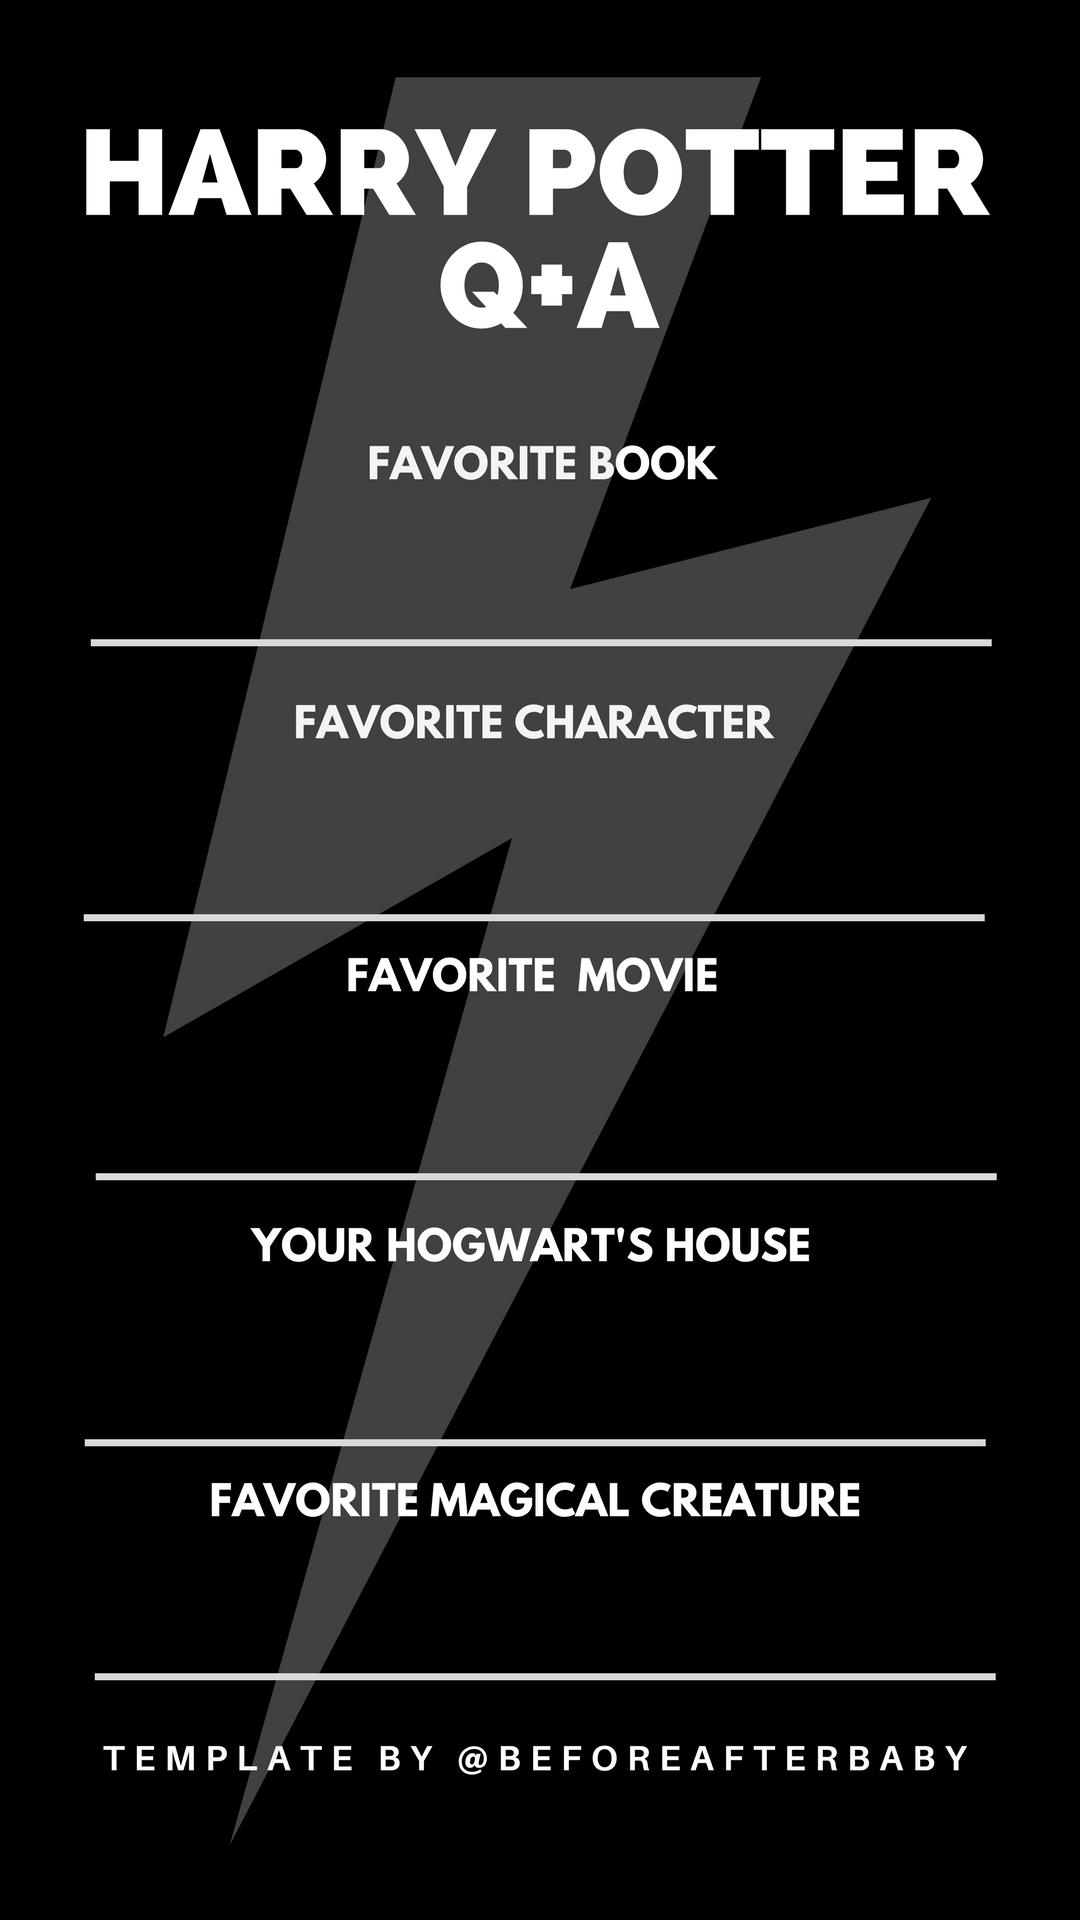 Harry Potter #Instagram Story Template #HarryPotter